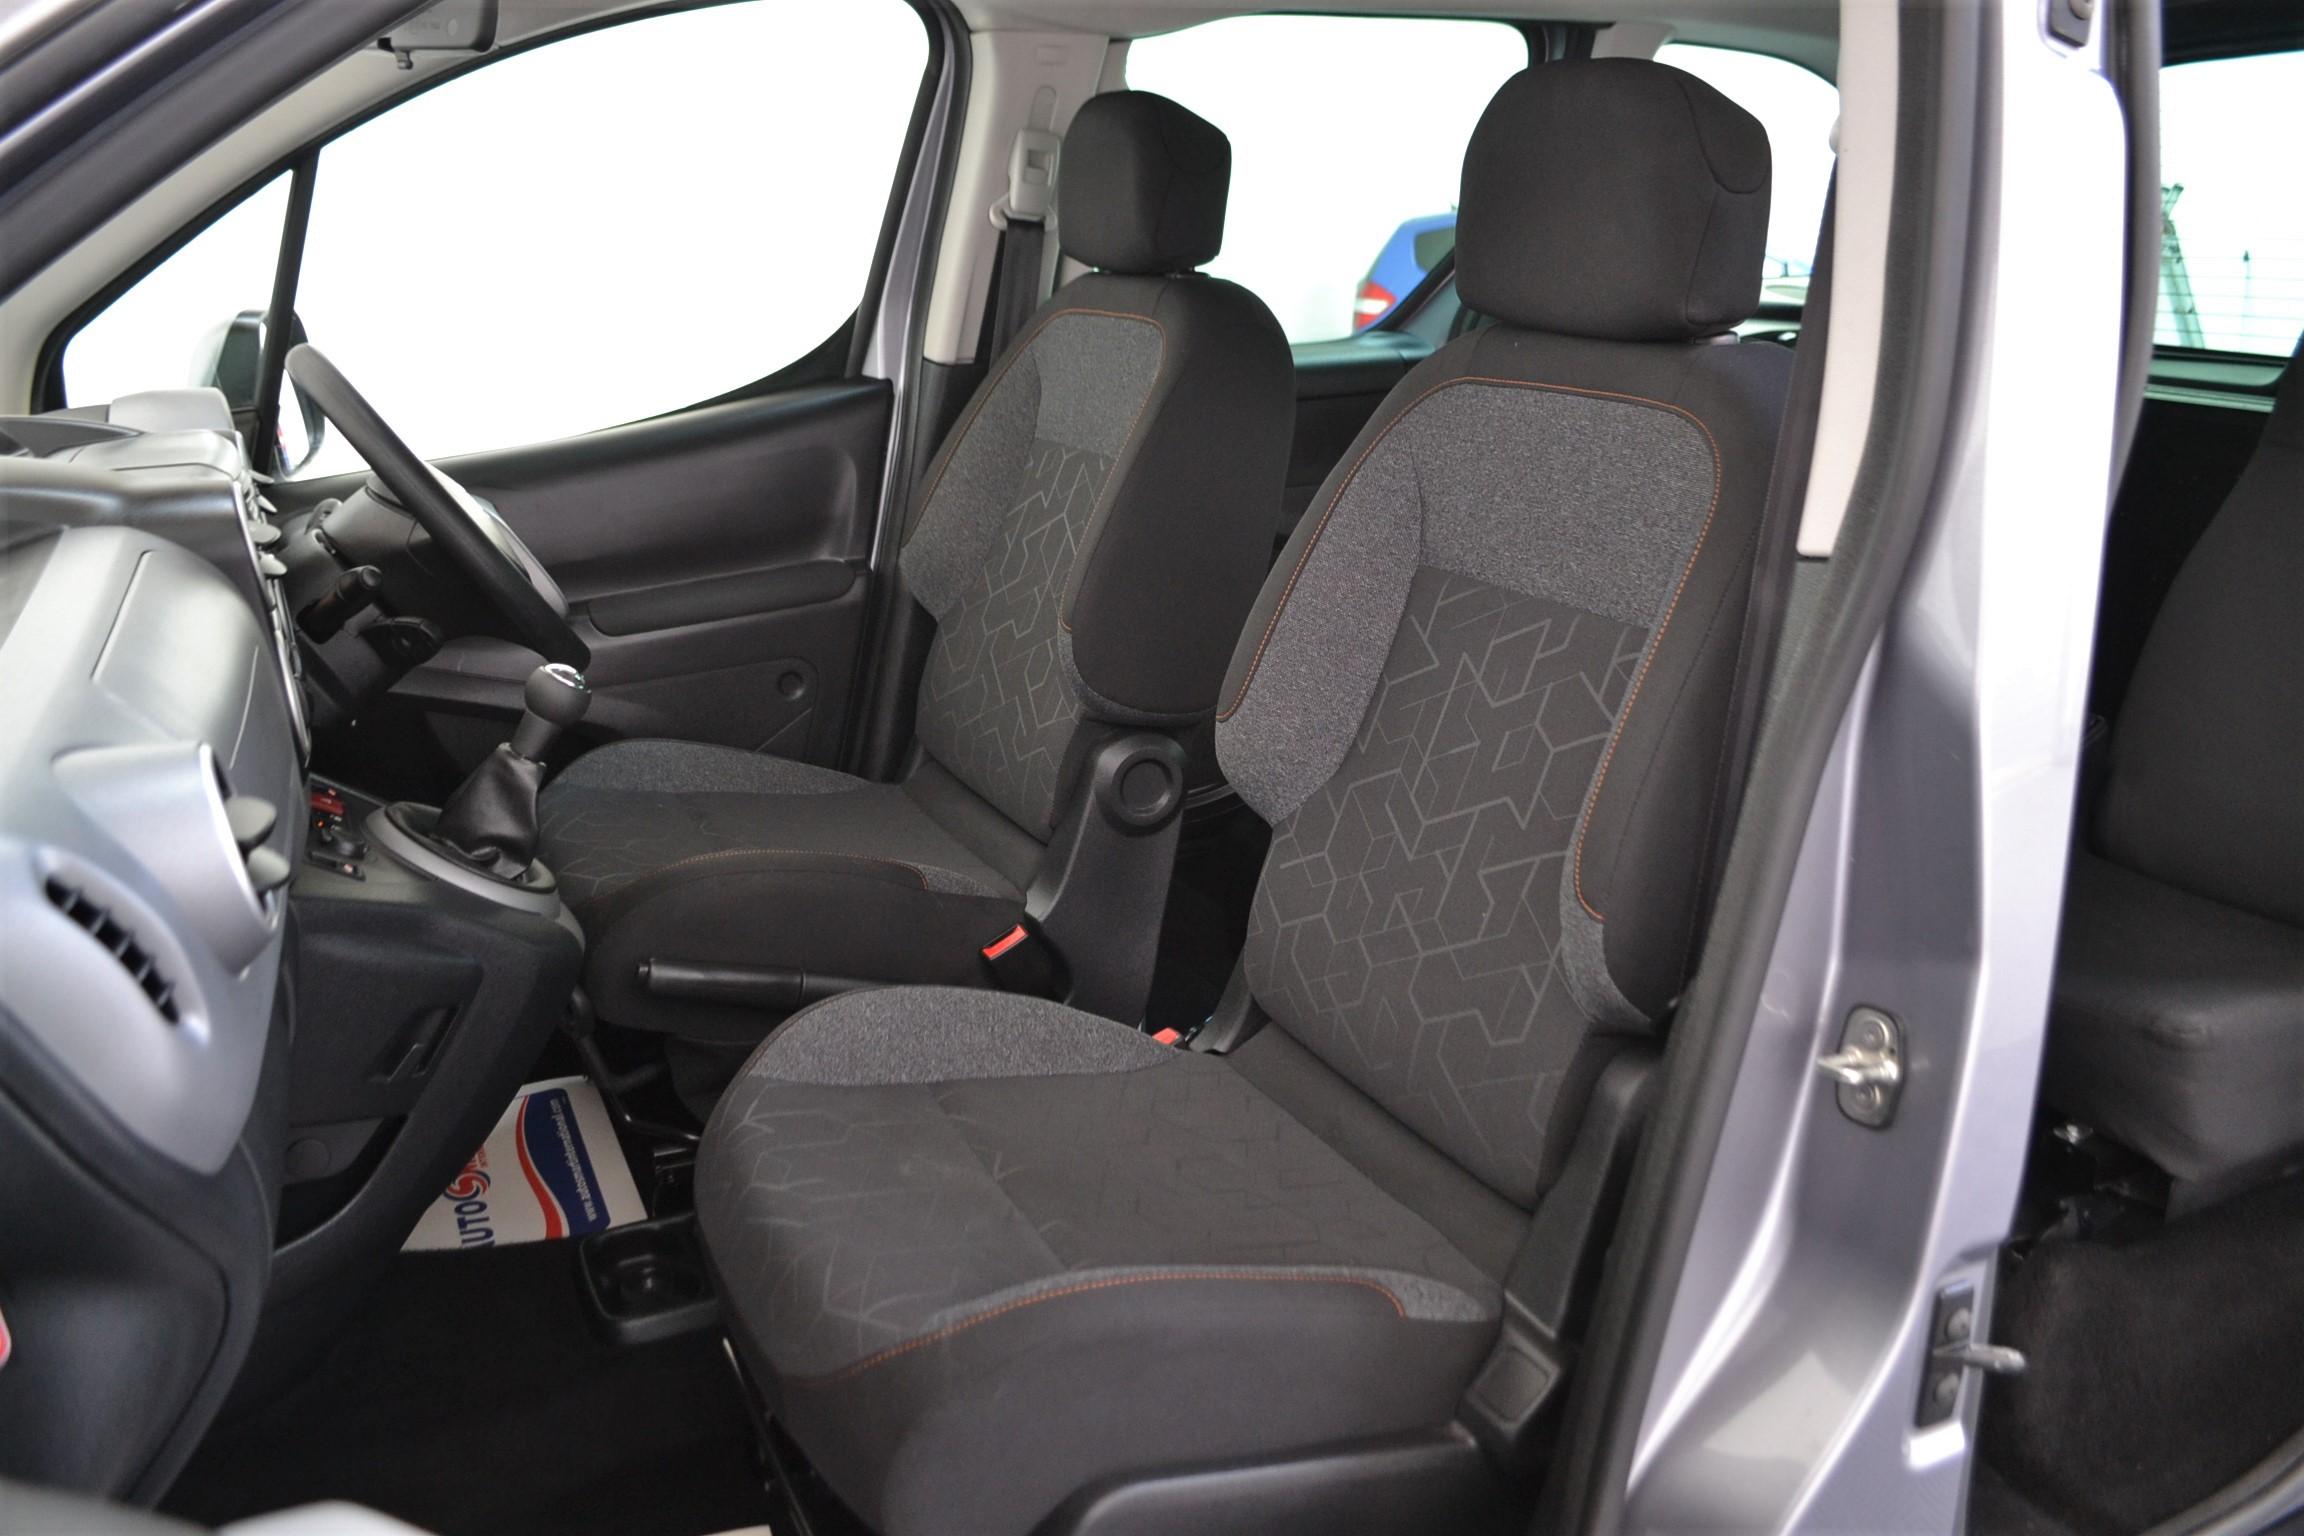 WAV Cars For Sale Bristol Wheelchair Accessible Vehicles Used For Sale Somerset Devon Dorset Bath Peugeot Partner SD17 OZL 14